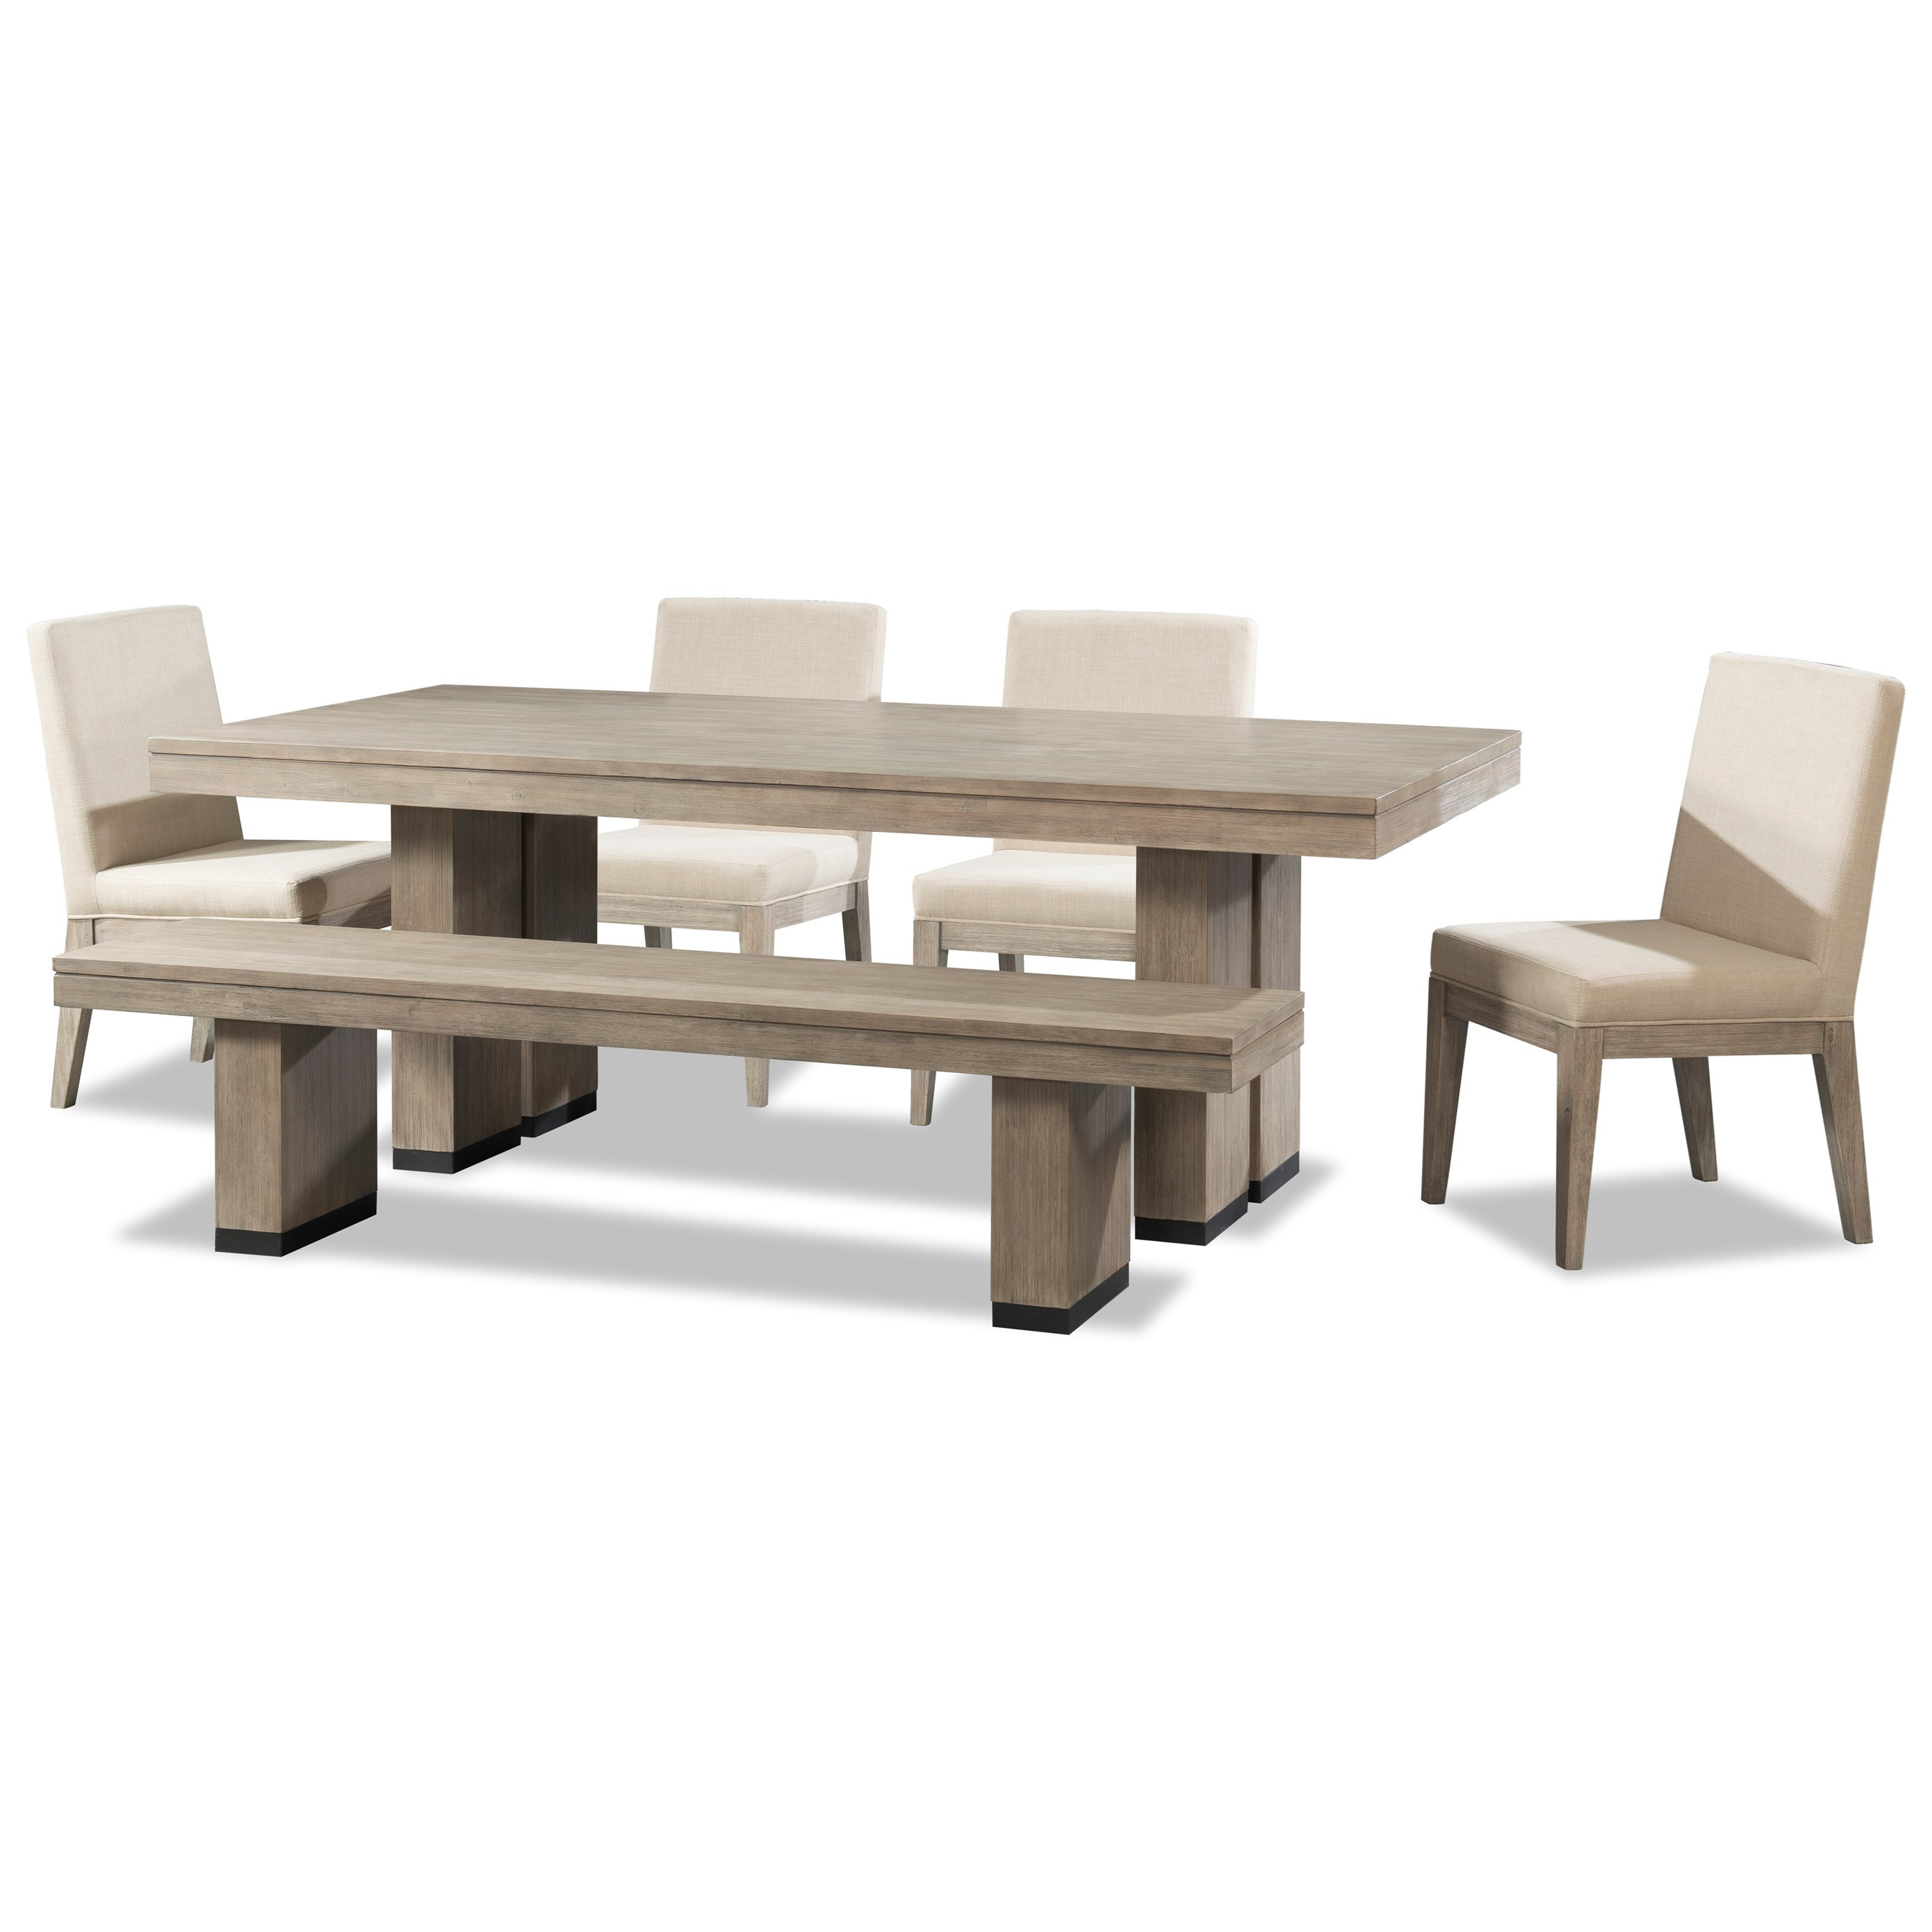 Cresent Fine Furniture Larkspur 6 Piece Trestle Table and  : products2Fcresentfinefurniture2Fcolor2Flarkspur20503503 1502B4x1572B159 b1 from www.belfortfurniture.com size 3200 x 3200 jpeg 553kB